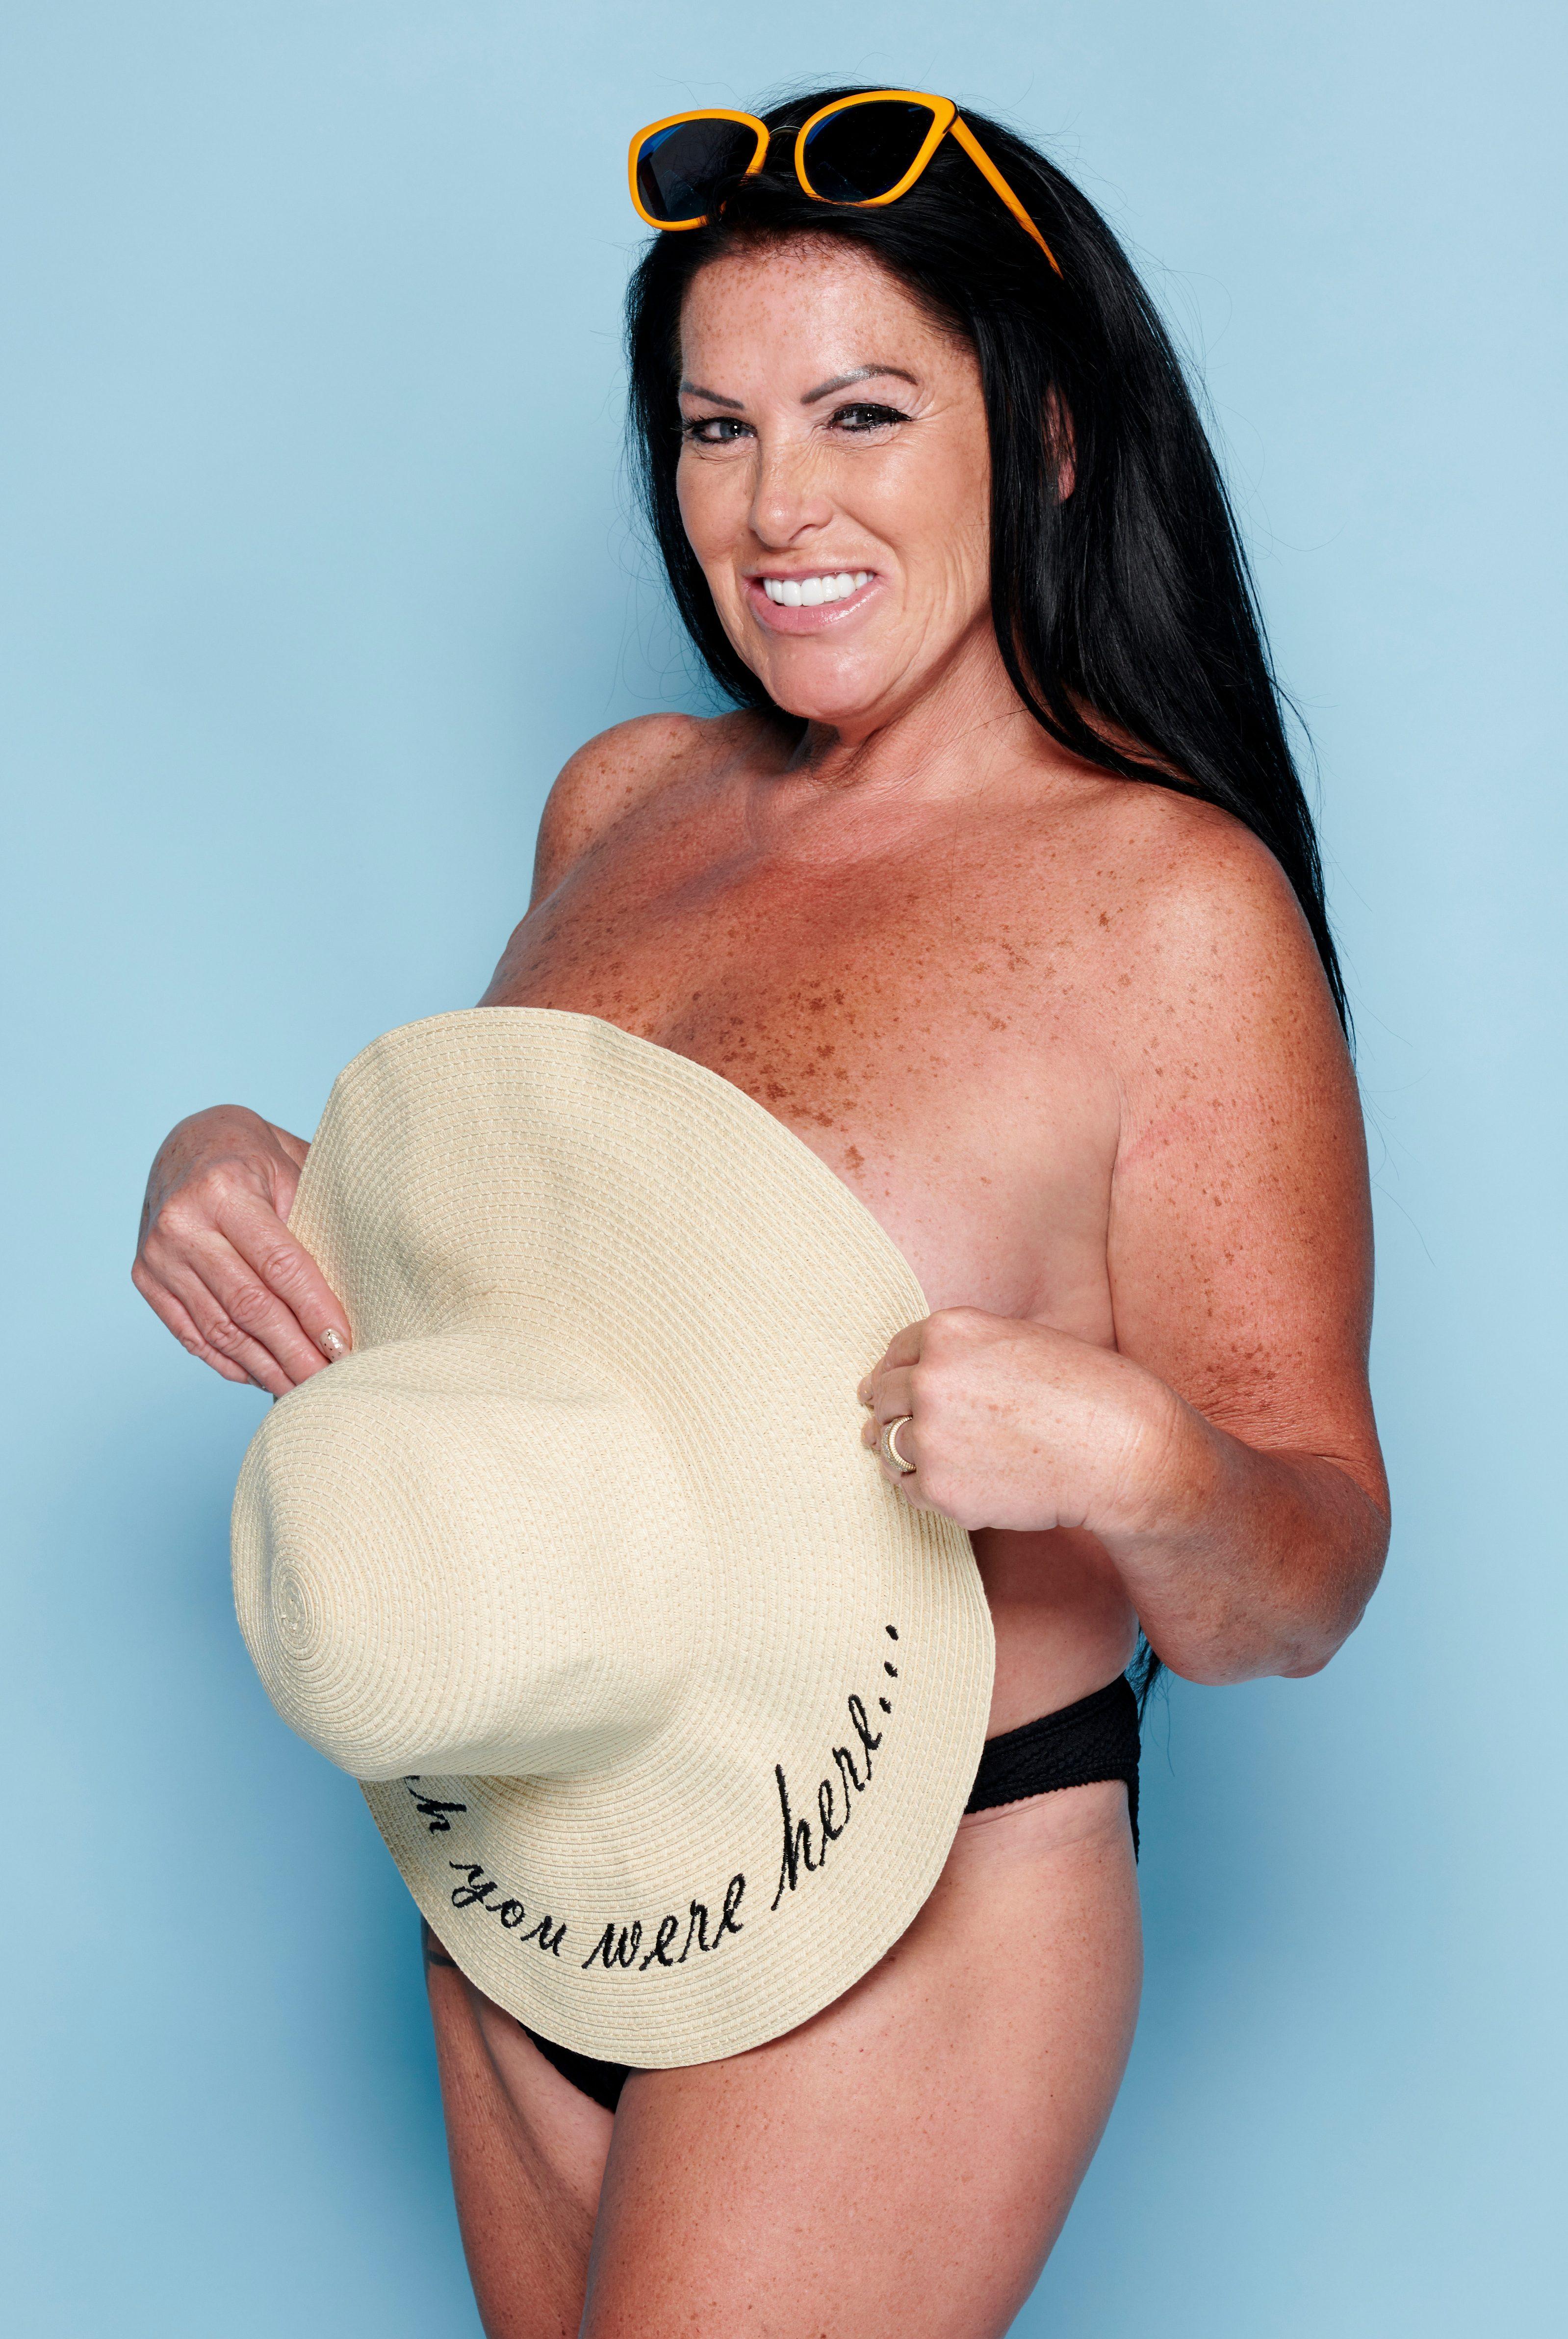 Big boobs nudist beach pageant